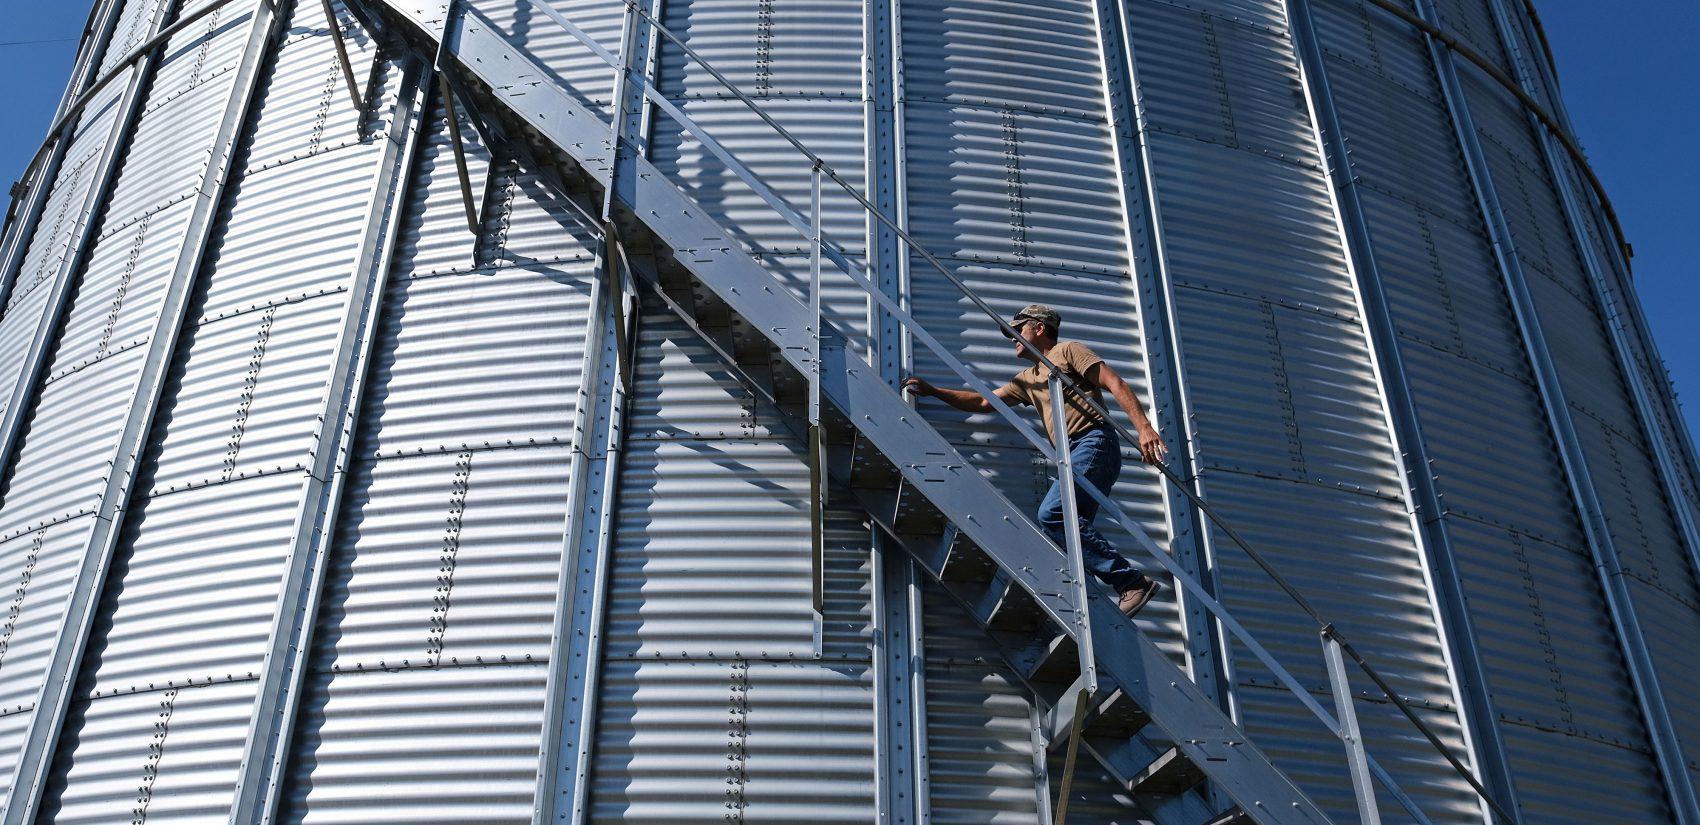 Grain farmer Don Cairns walks to the top of a grain silo Sept. 25, 2019, at Cairns Family Farm in Sadsbury Township, Pennsylvania. (Matt Smith for Keystone Crossroads)